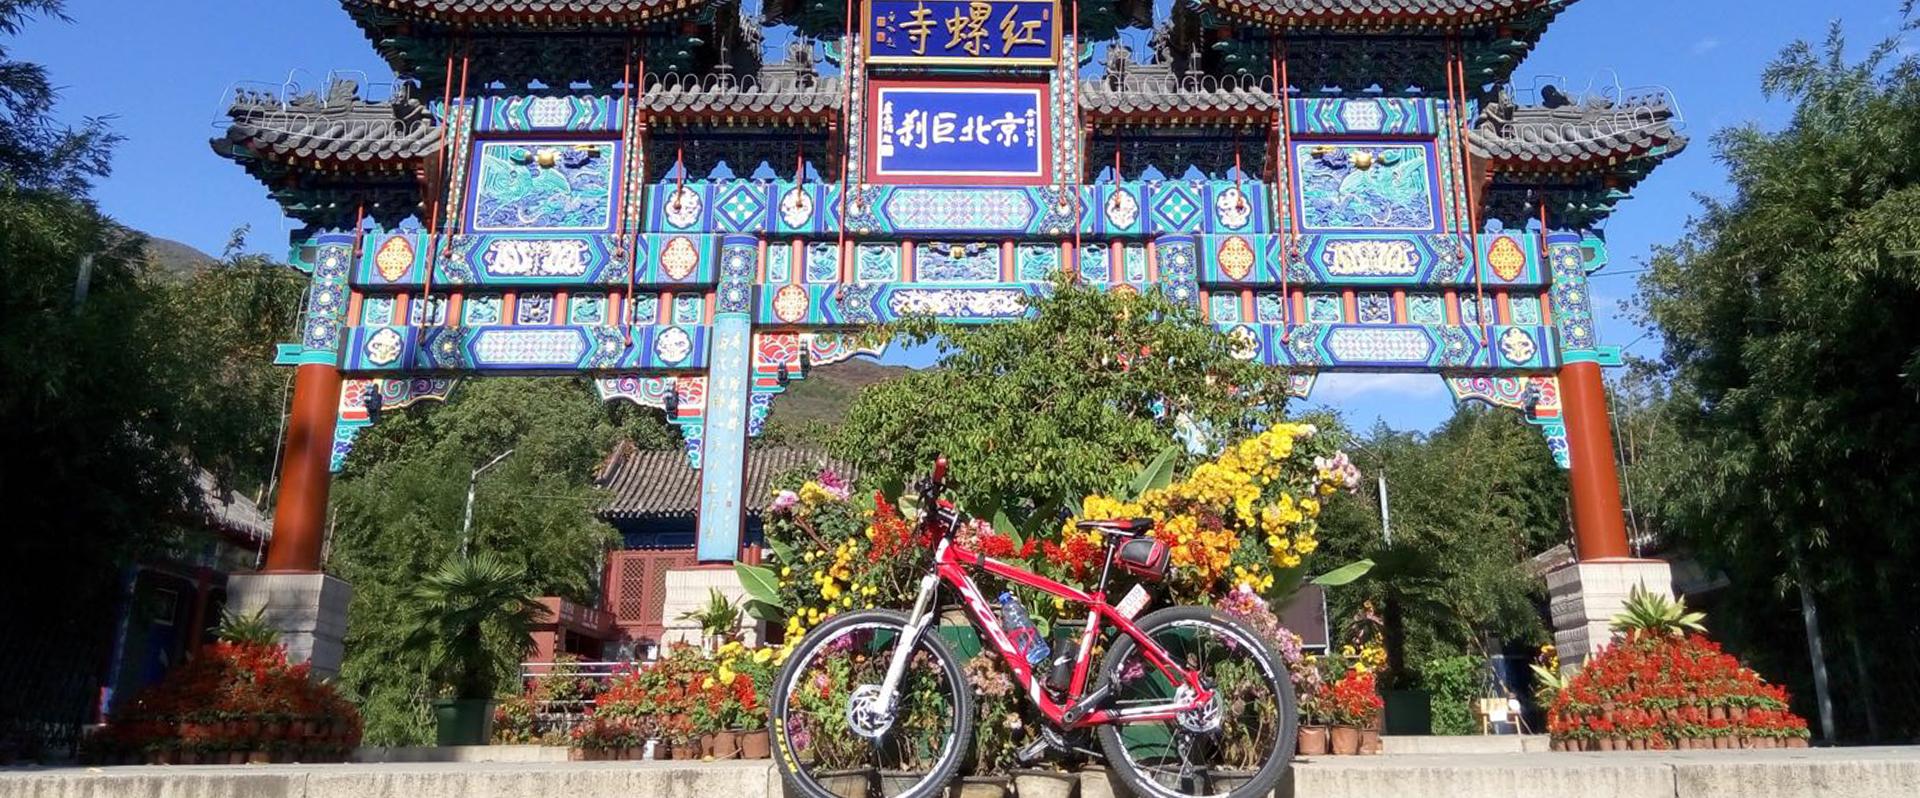 A bicycle at the Great Wall of China